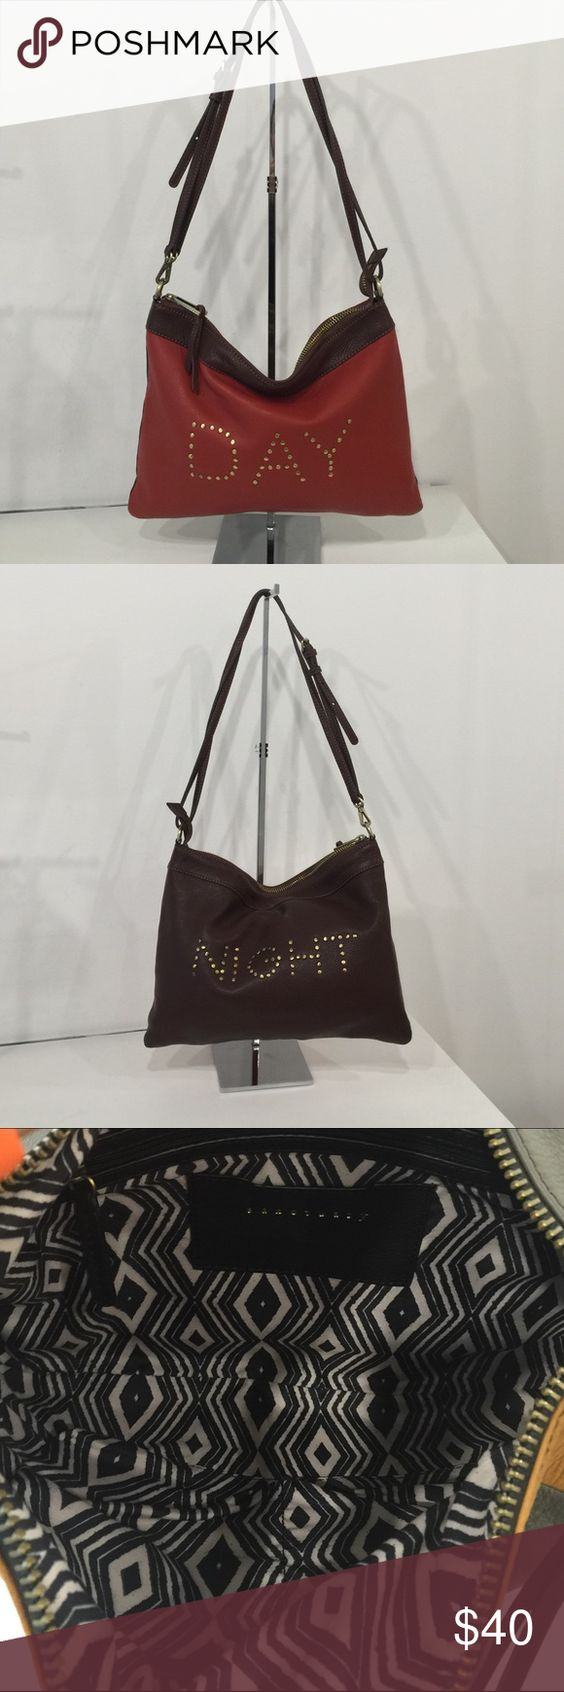 Sanctuary handbags crossbody Day/night crossbody 2 toned in brown and Brooklyn brick red Sanctuary Bags Crossbody Bags